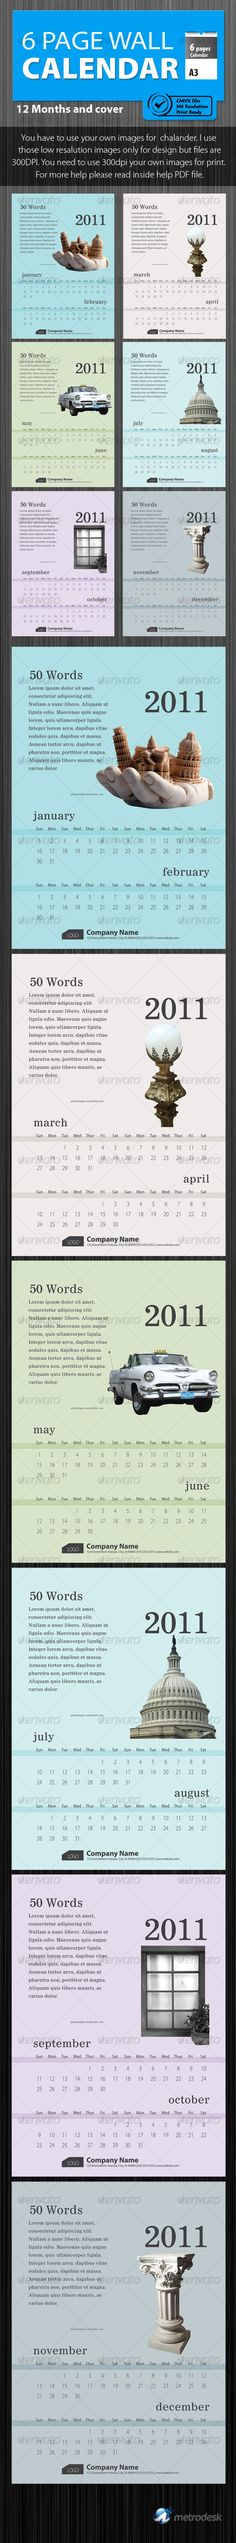 Wall calendar 2011 [6 Page] Print Ready  - Calendars Stationery